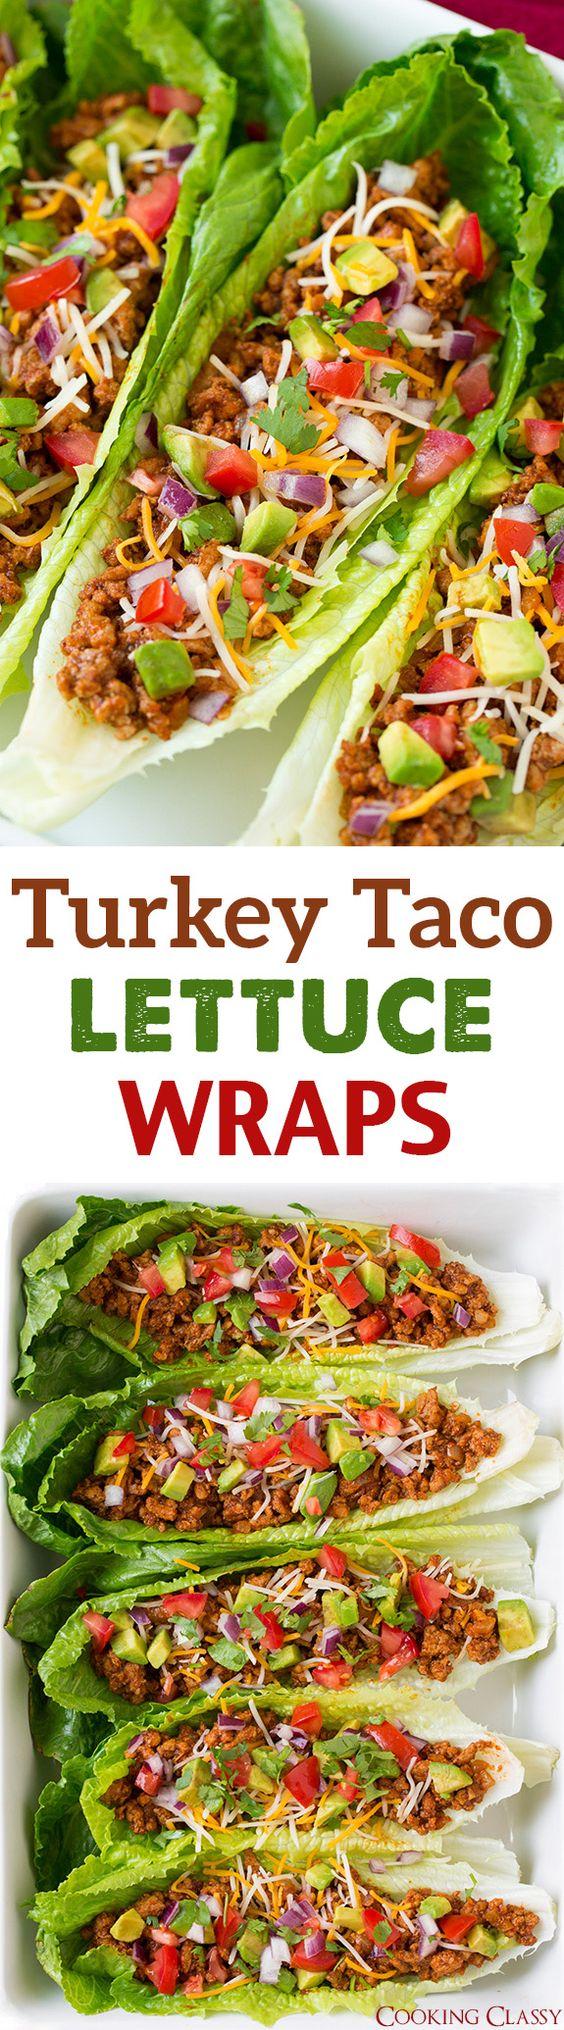 Taco lettuce wraps, Turkey tacos and Lettuce wraps on Pinterest